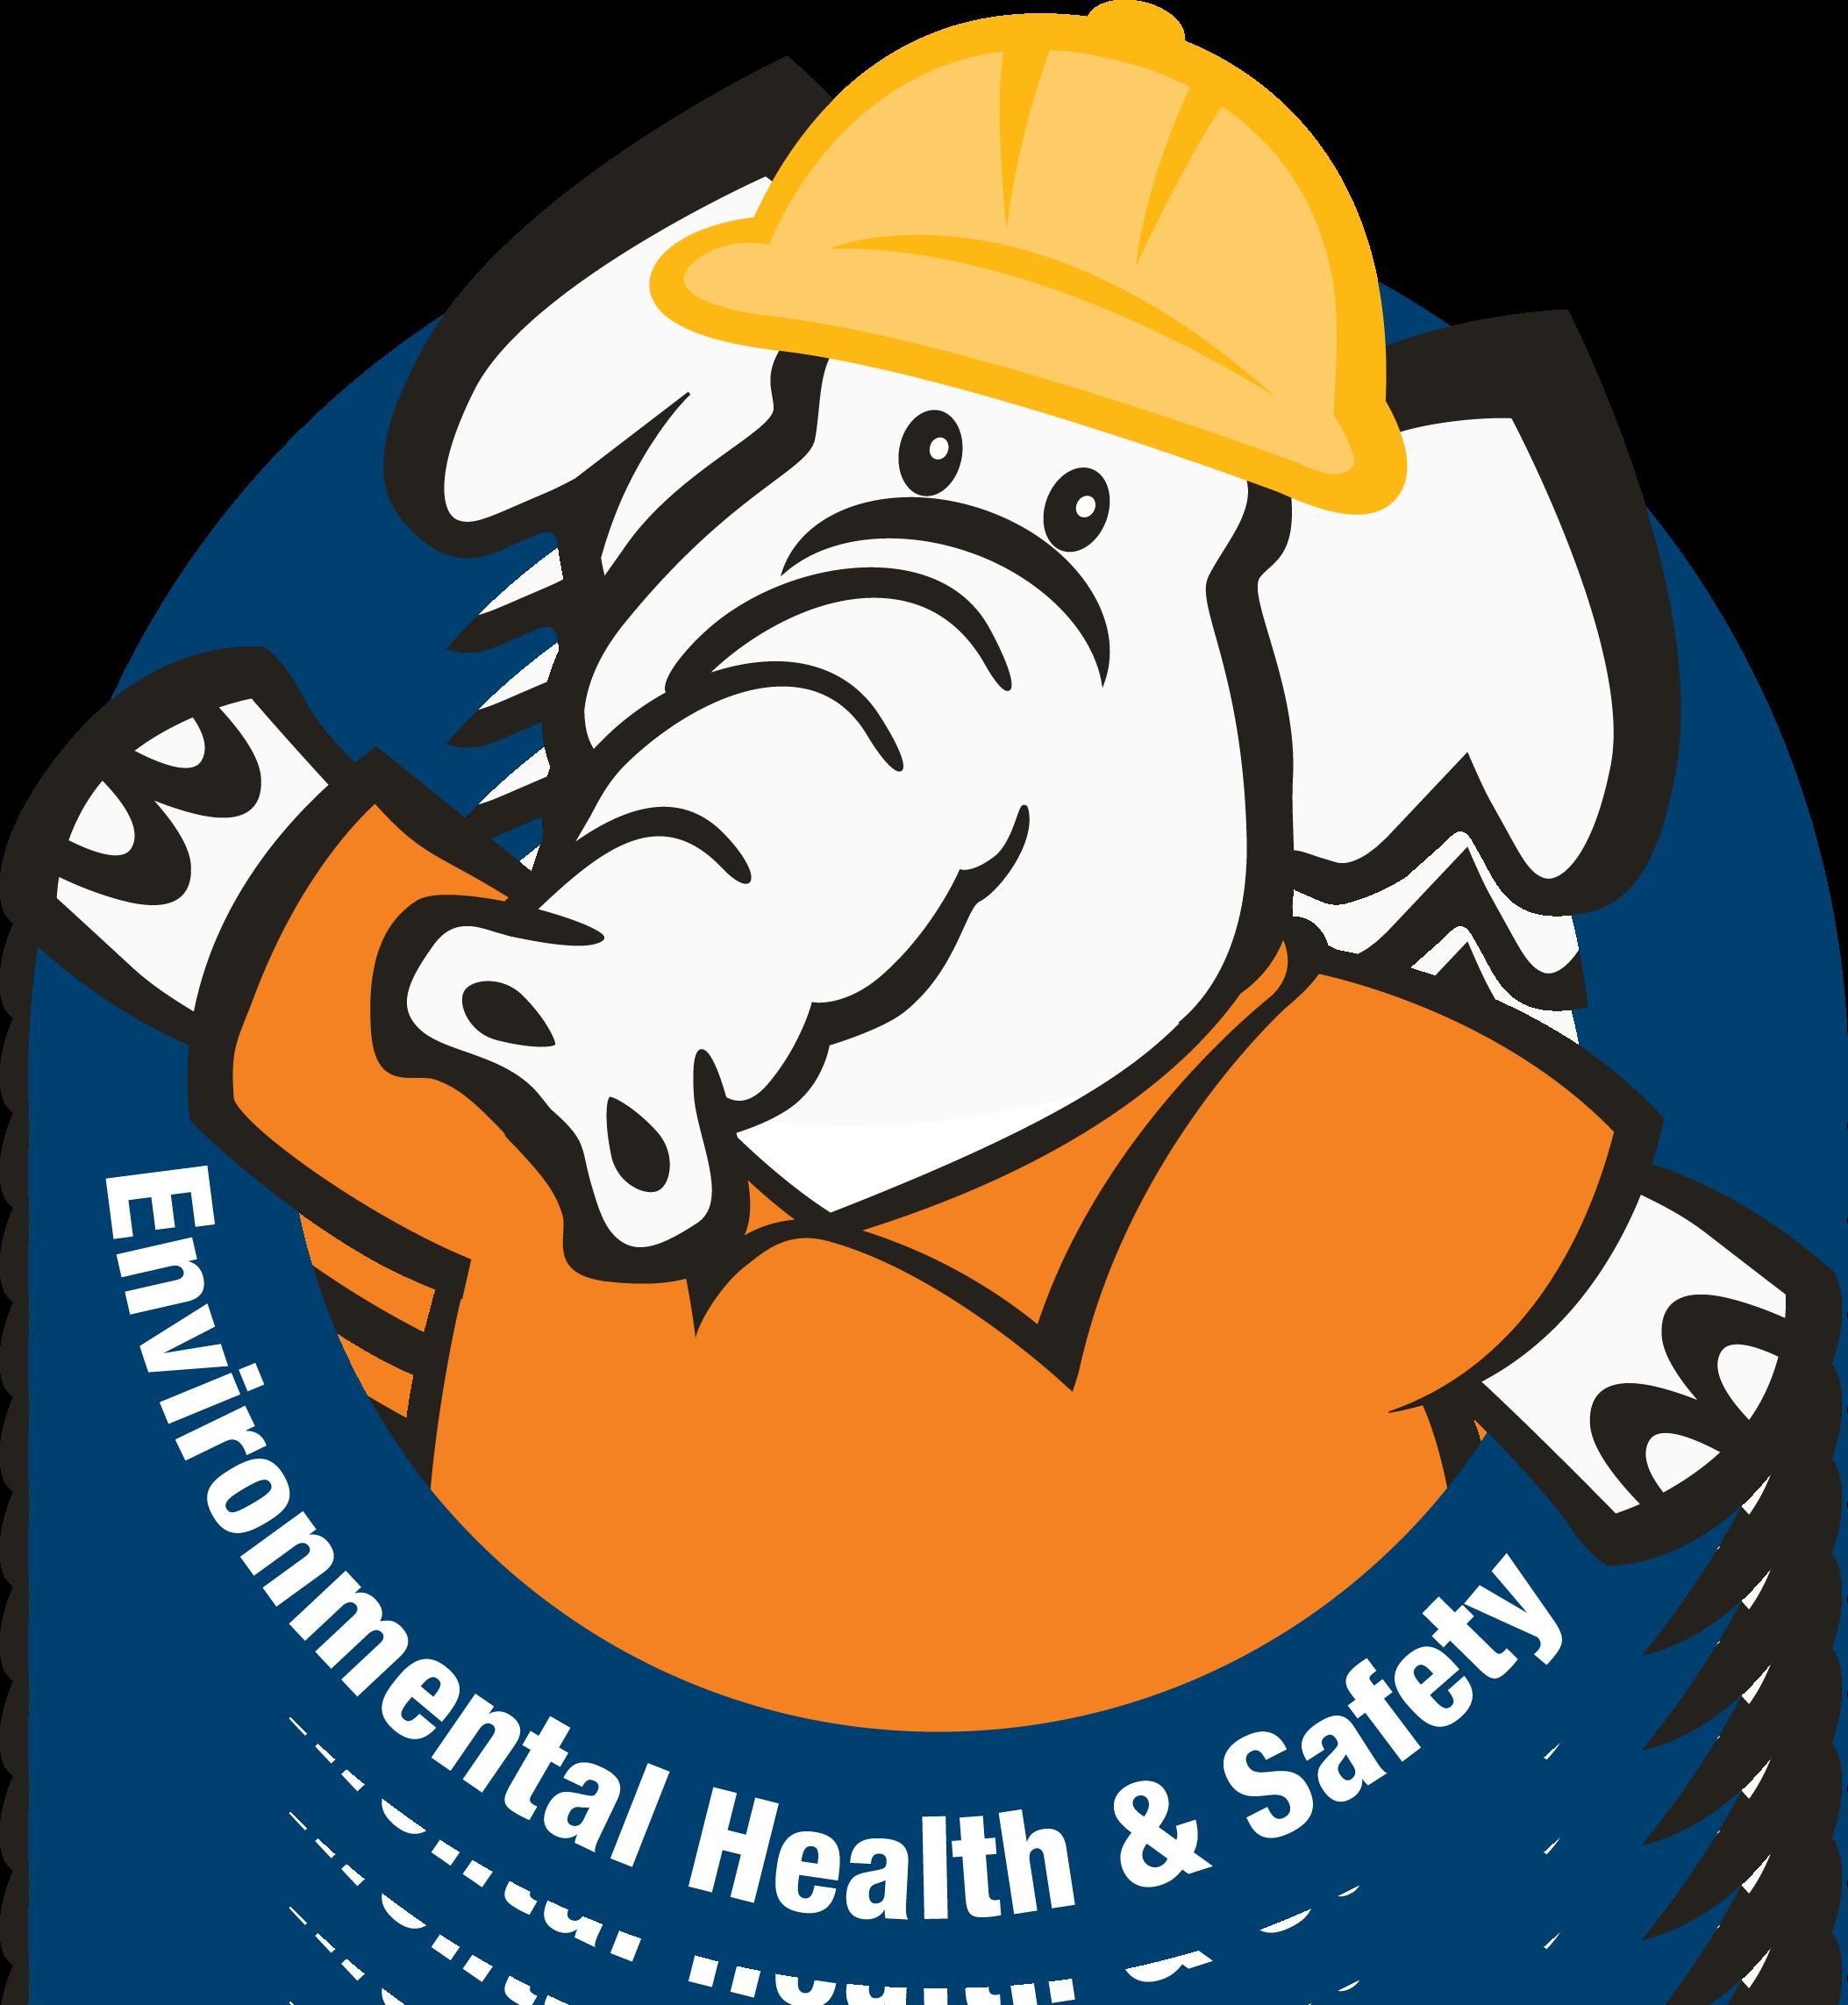 Environment clipart safe environment. Titan safety news risk